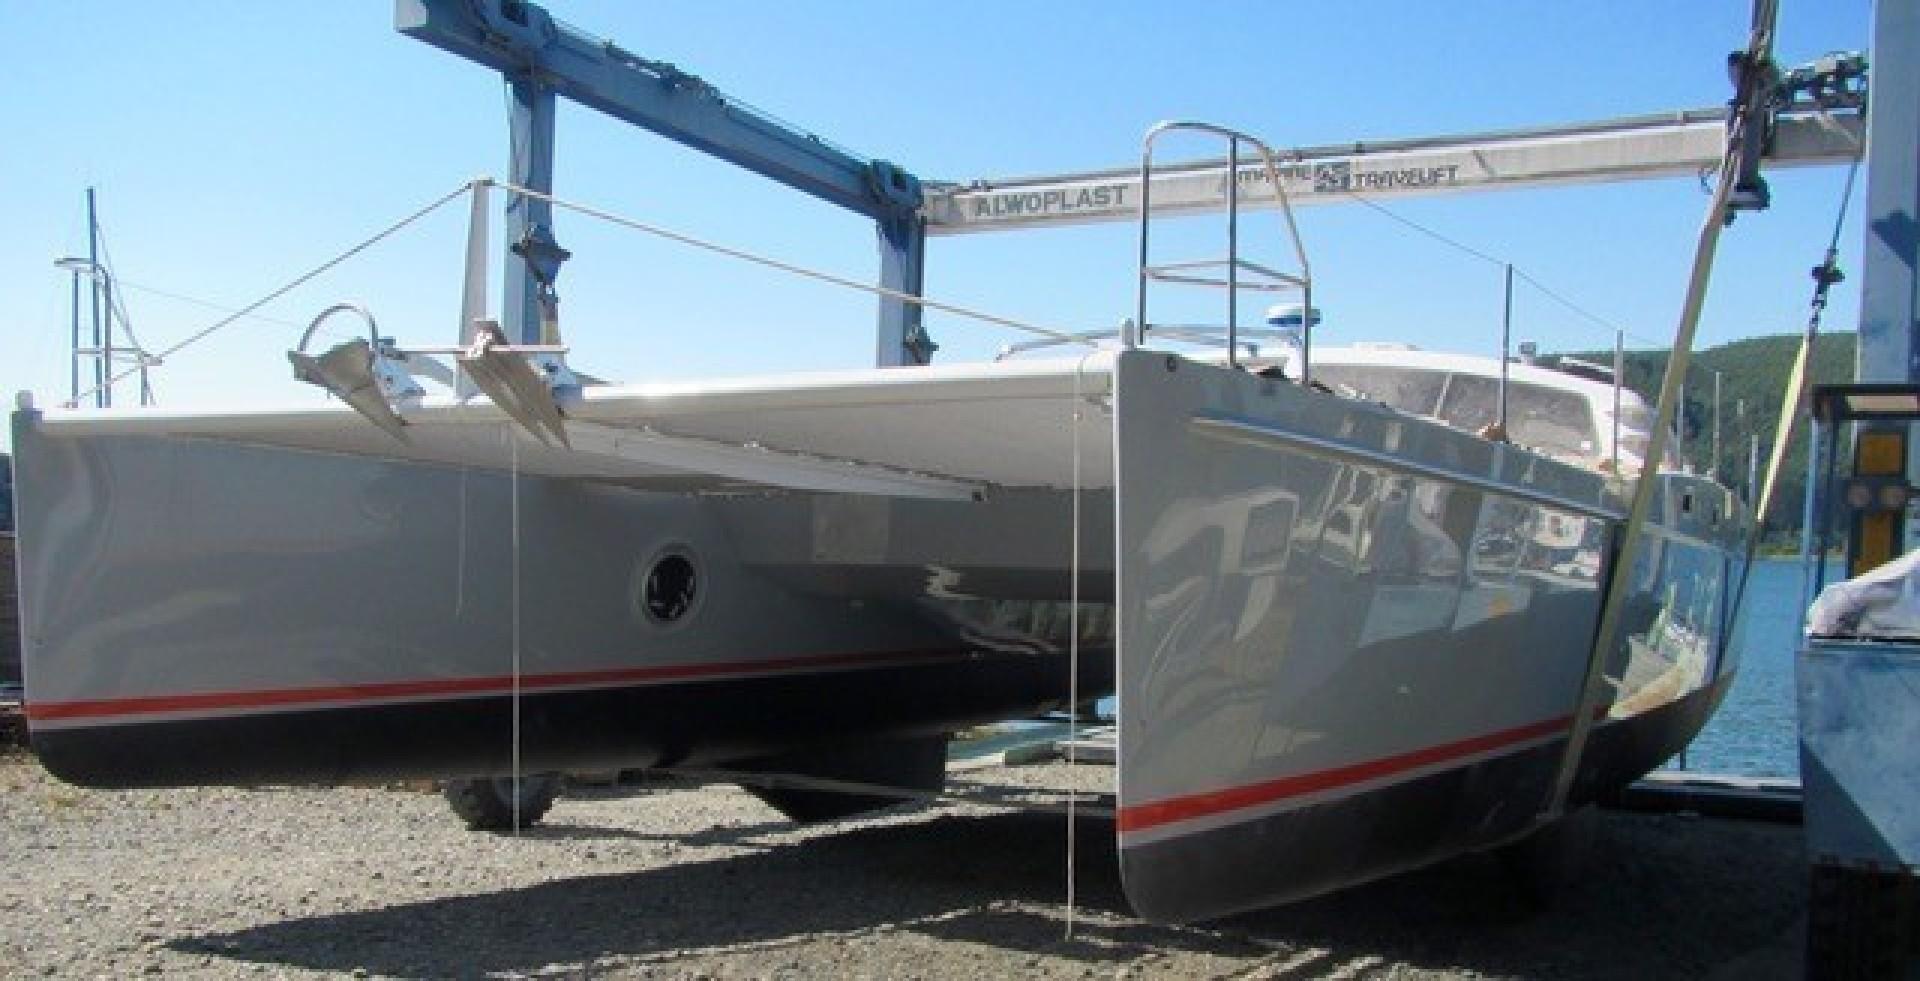 Atlantic-49 Catamaran 2018-Wabi Sabi Stuart-Florida-United States-1406859 | Thumbnail